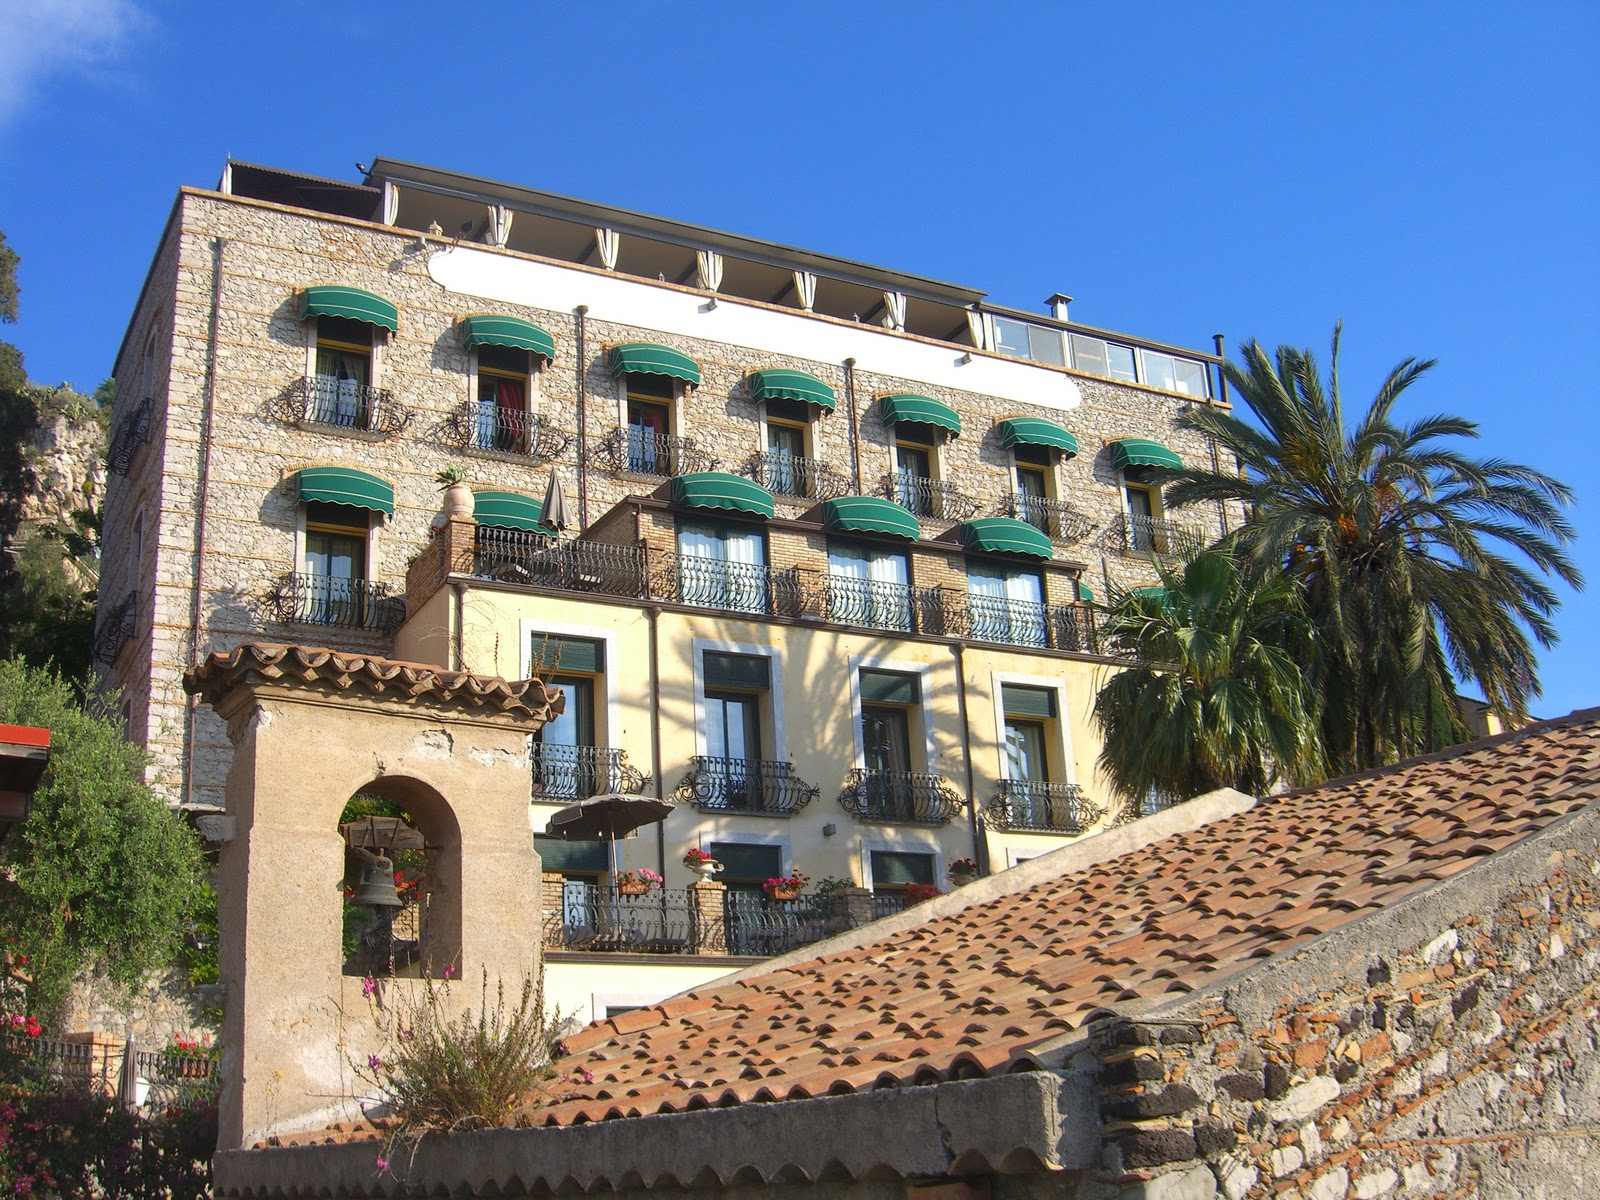 Art de vivre in southern europe villa carlotta boutique for Boutique hotel taormina